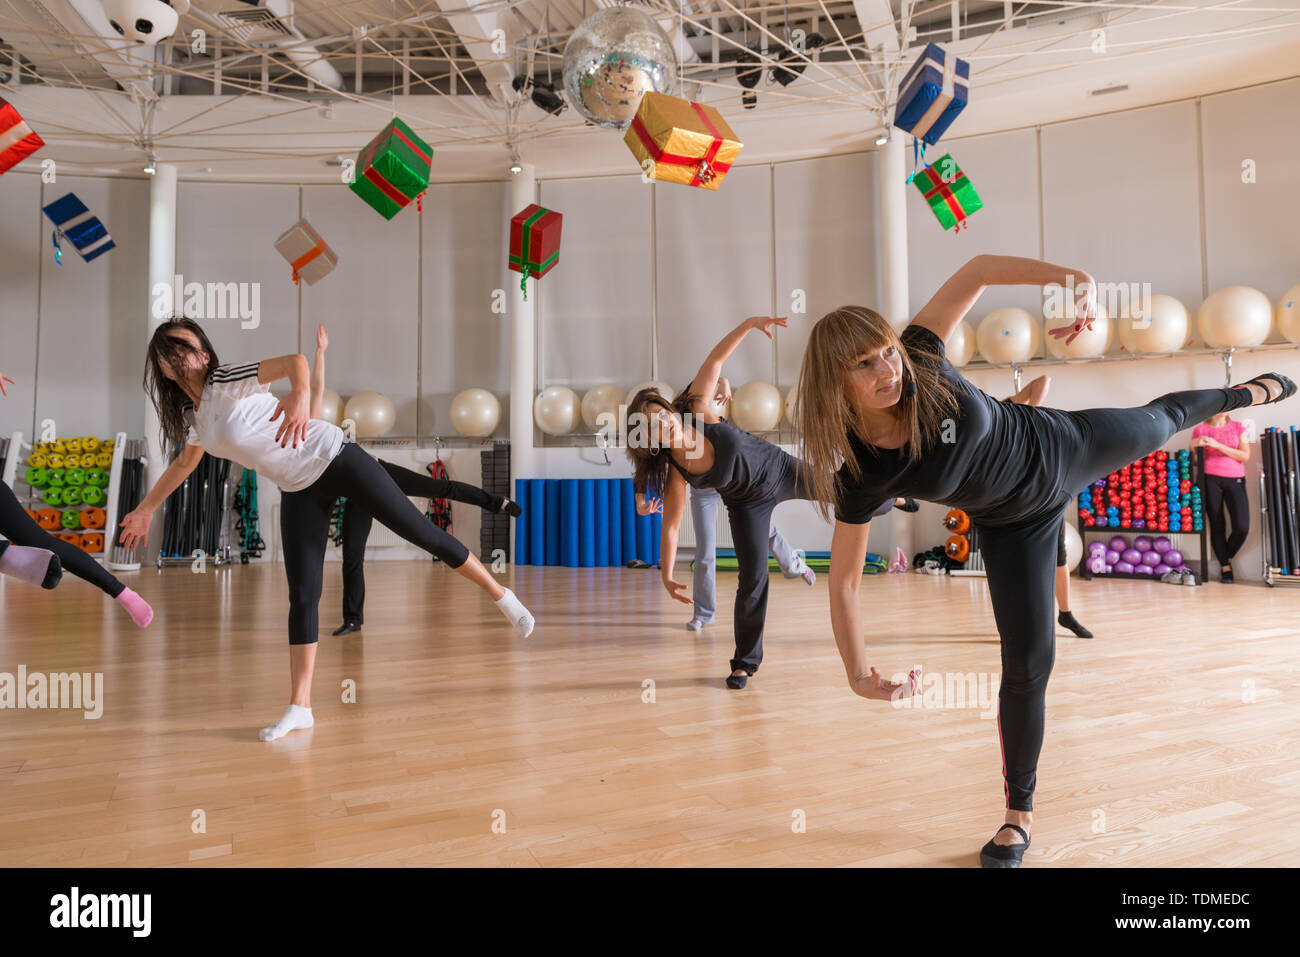 Dance class for women - Stock Image